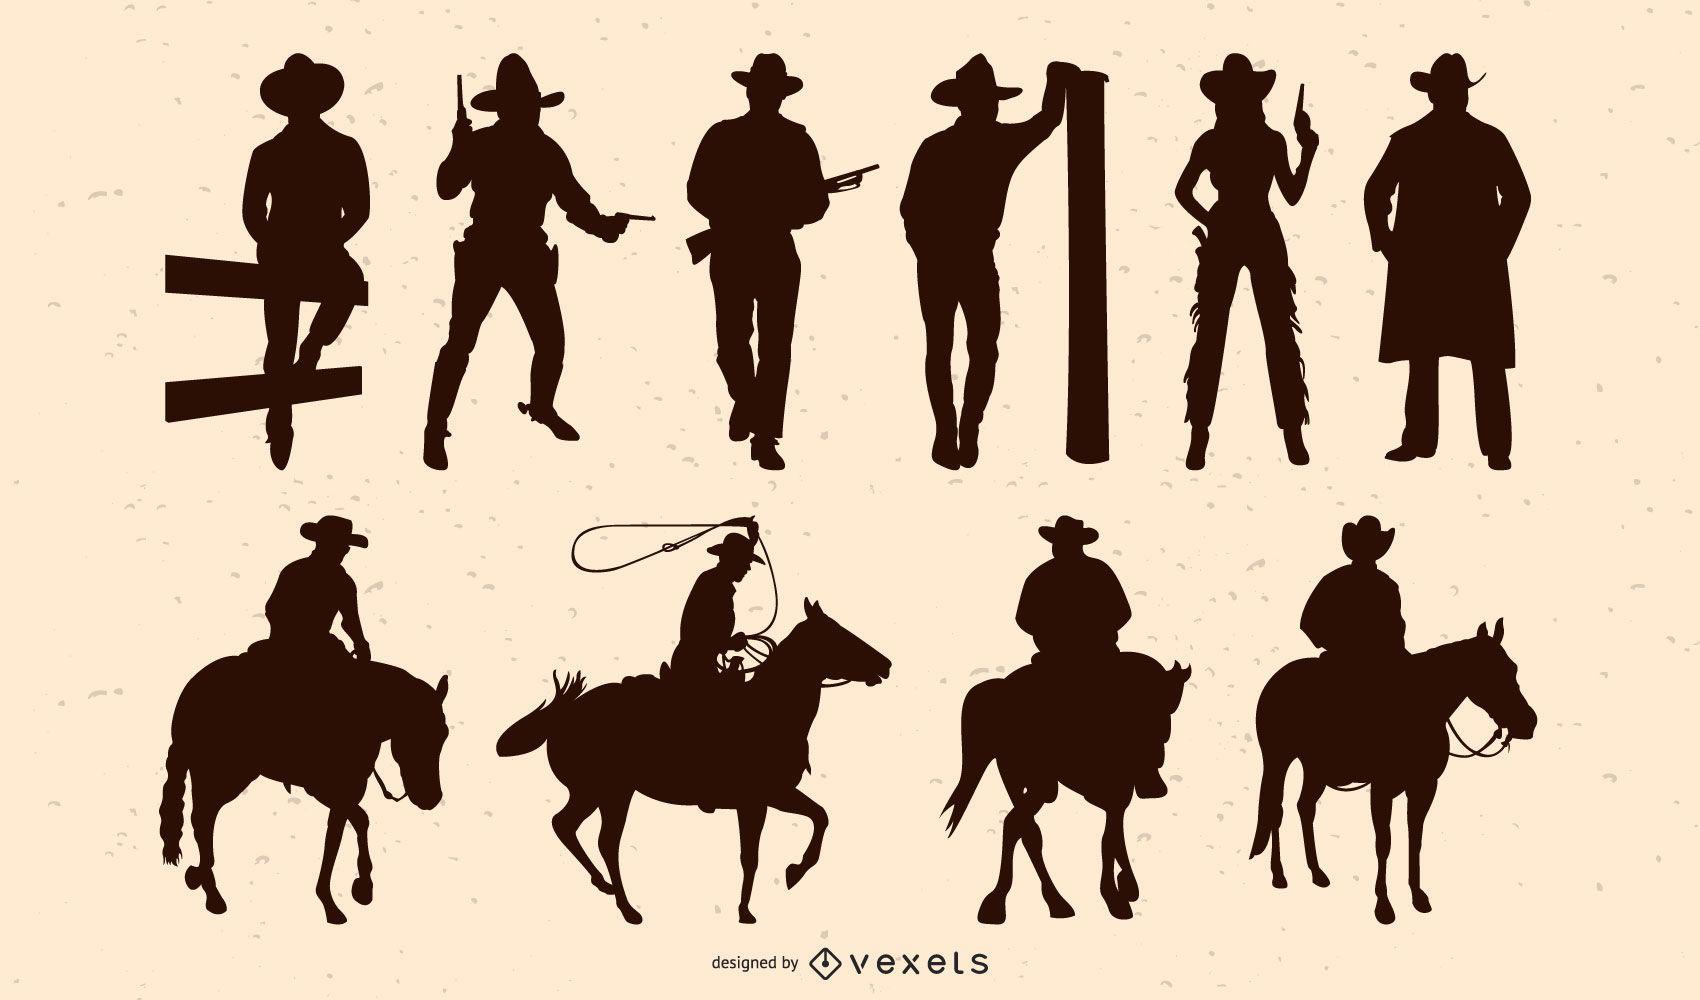 Cowboy People Silhouette Pack